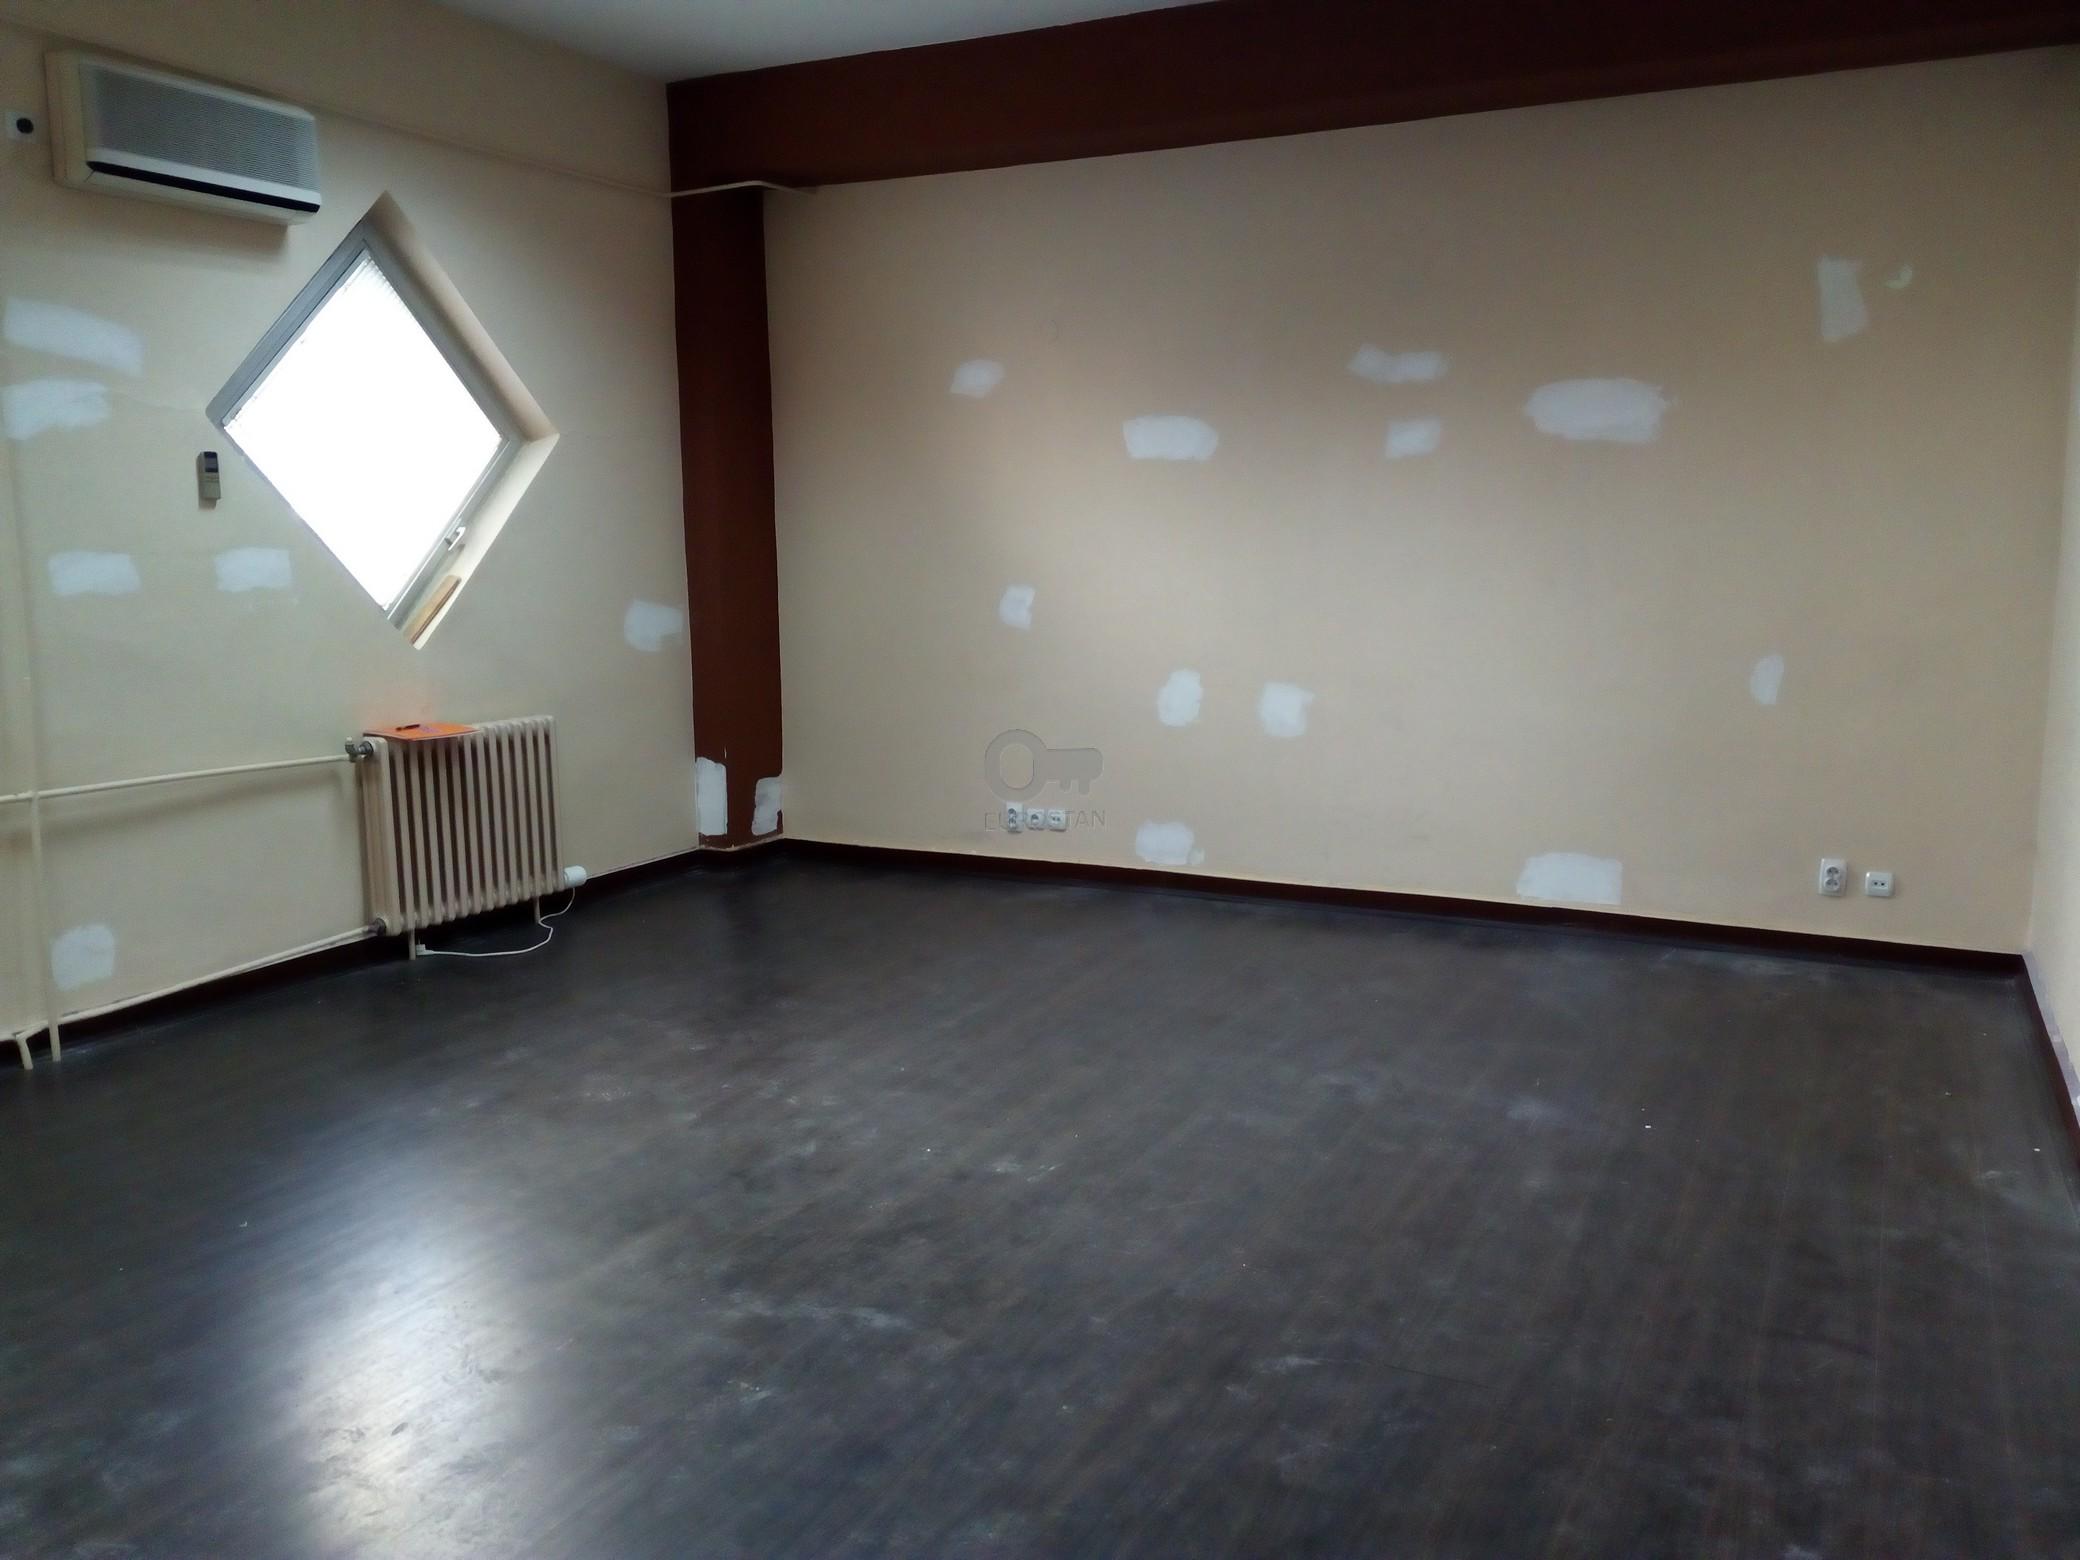 Poslovni prostor BANOVO BRDO 42000 EUR